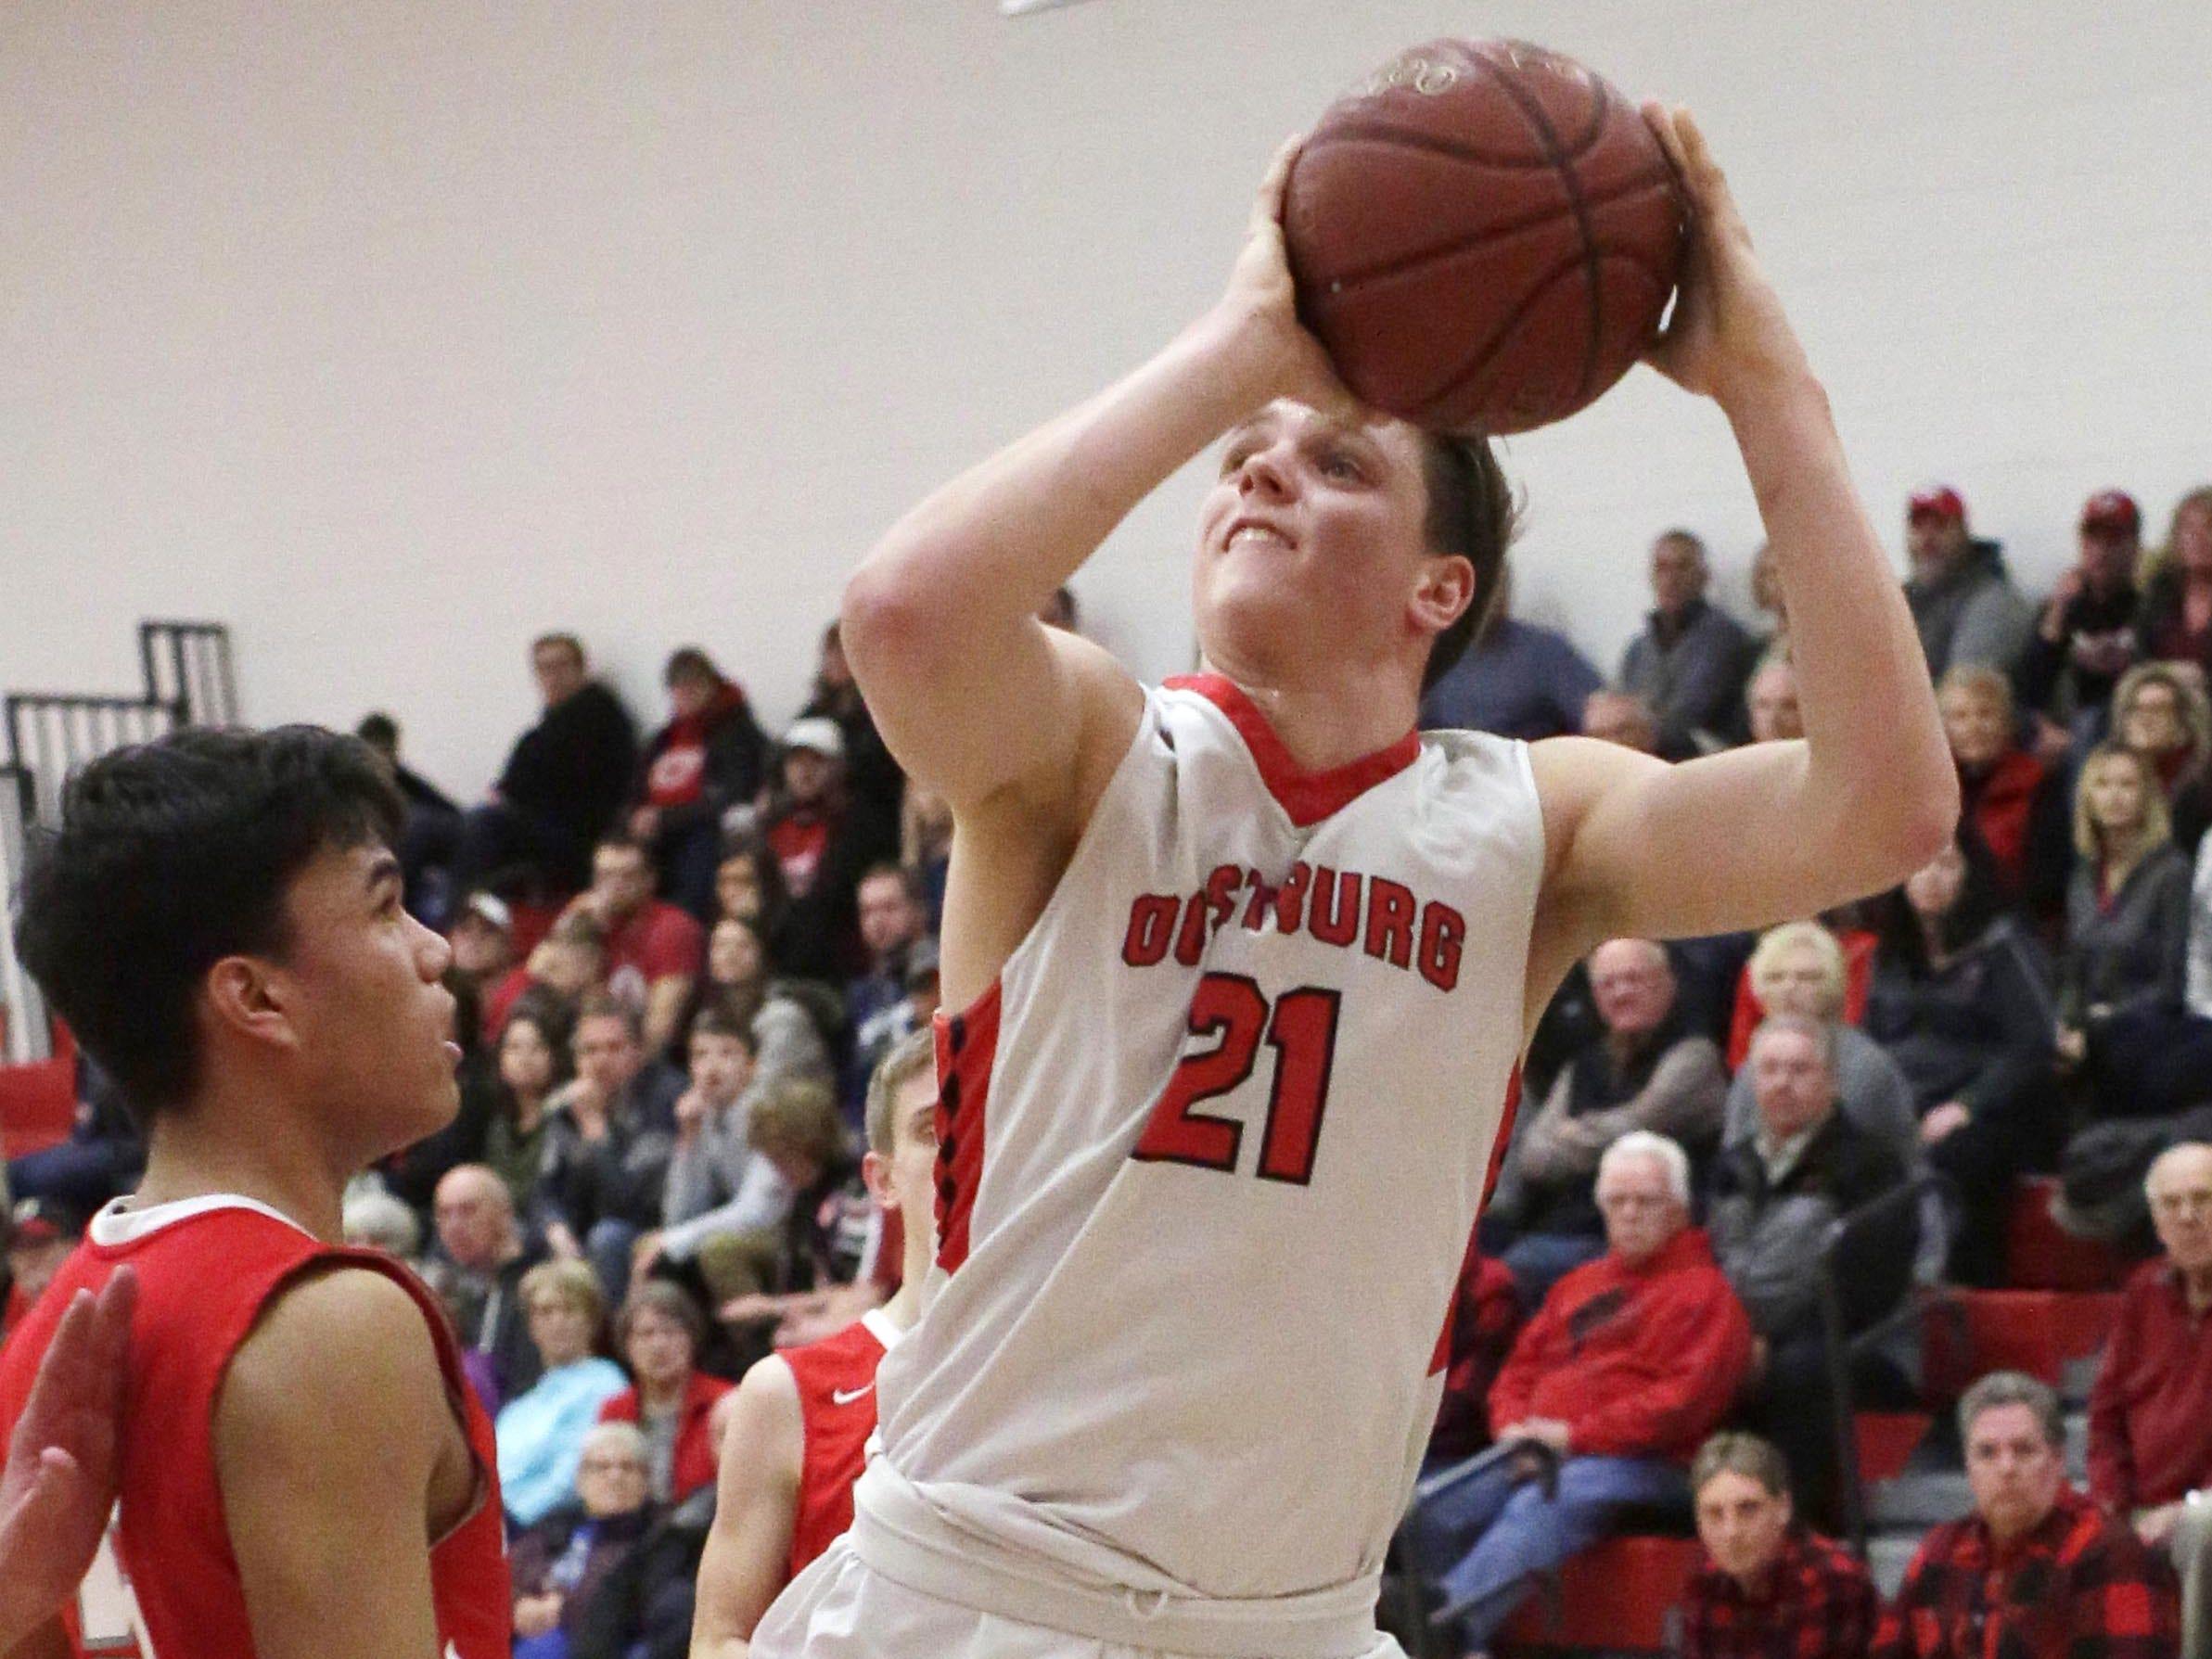 Oostburg's Ashtin Smies (21) looks to the basket against Manitowoc Lutheran, Friday, February 8, 2019, in Oostburg, Wis. Gary C. Klein/USA TODAY NETWORK-Wisconsin